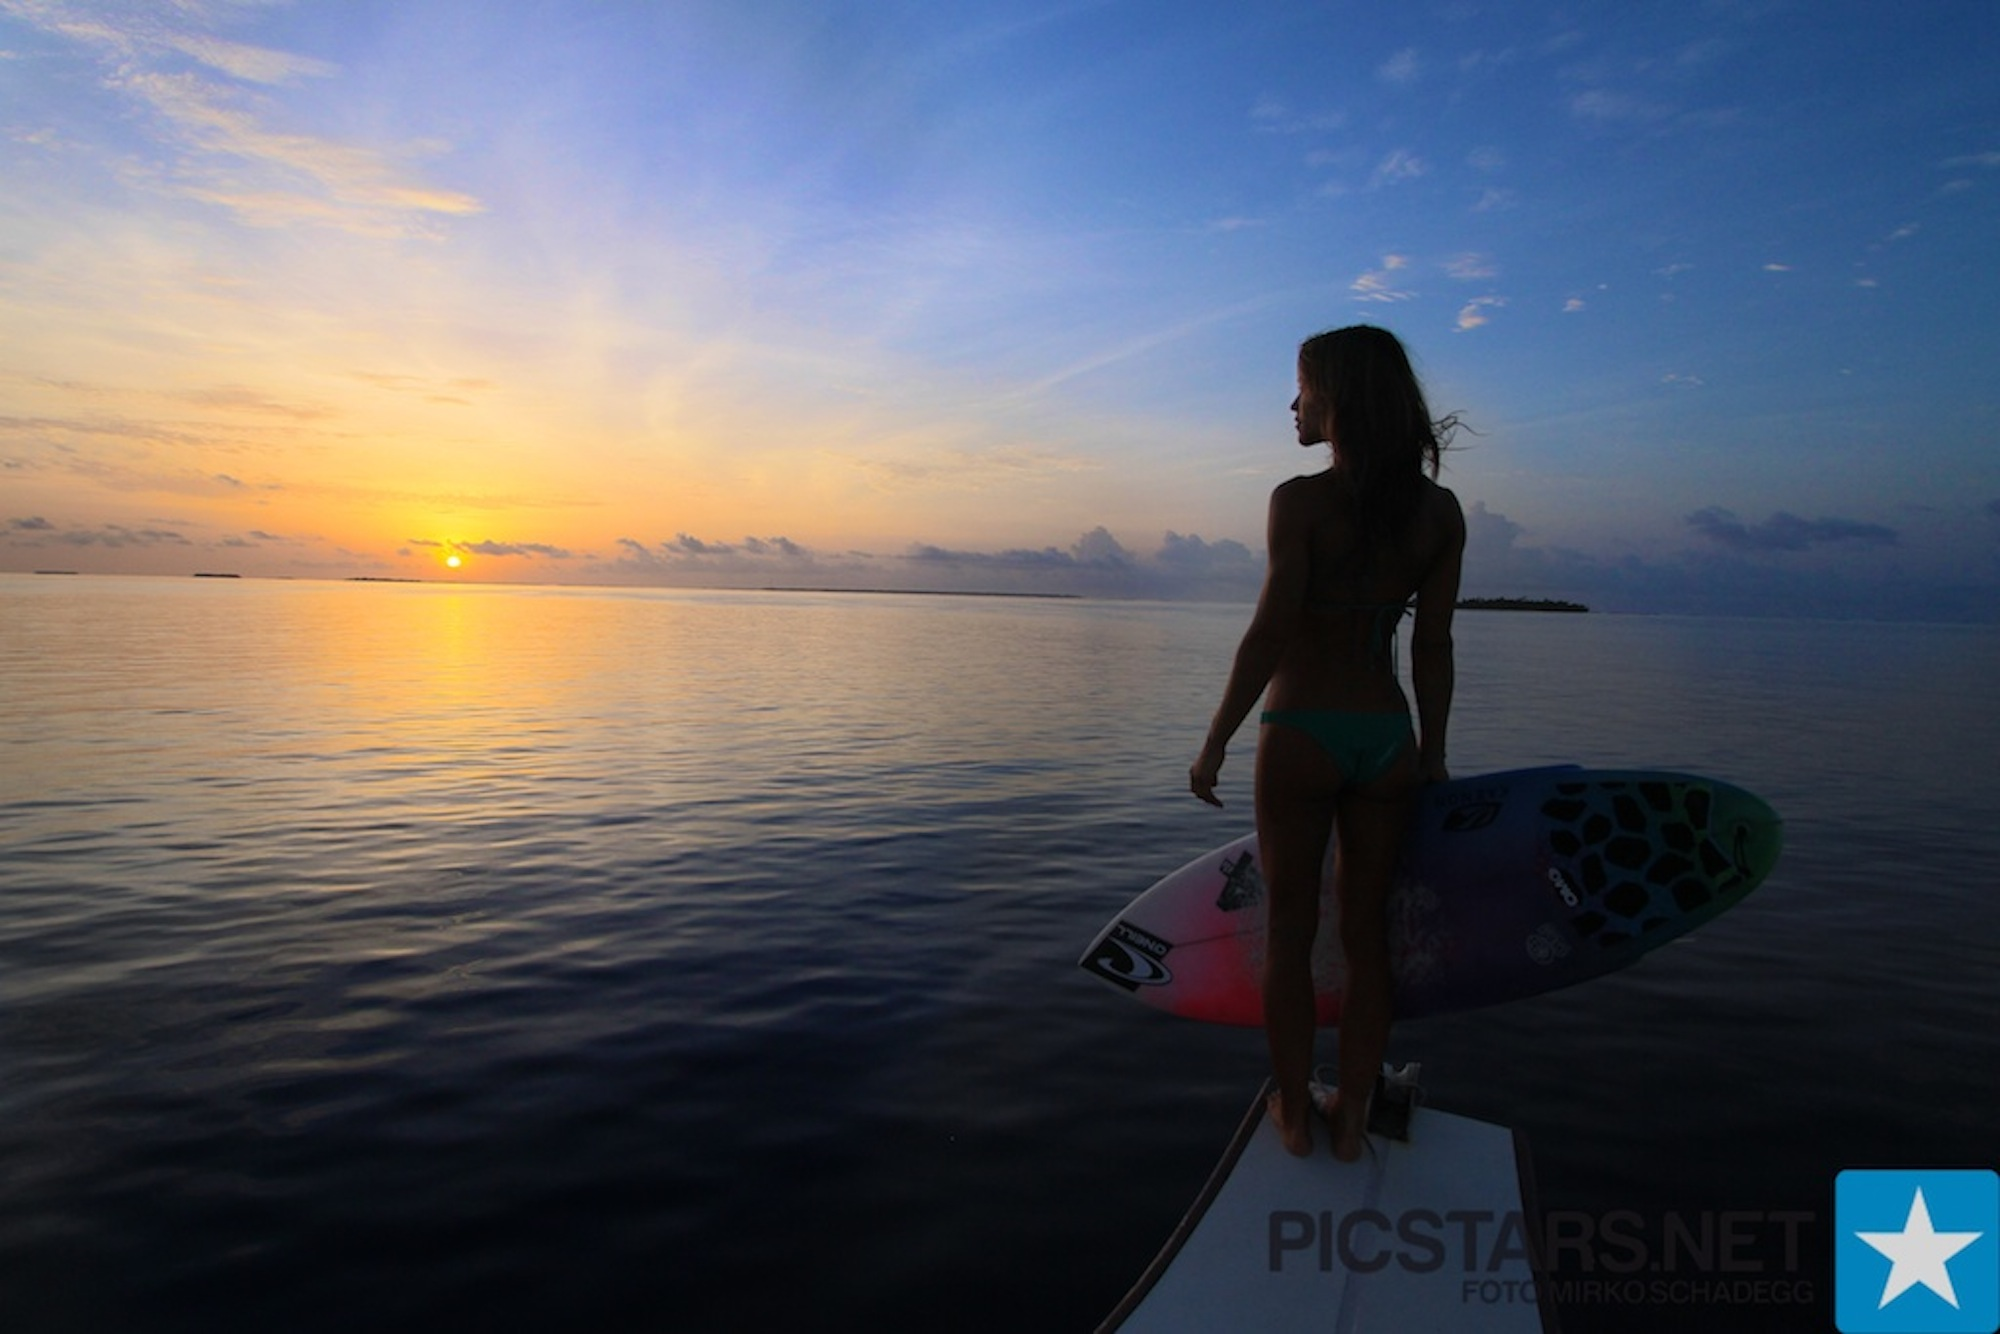 Sonnenuntergang! photo: Mirko Schadegg Picstars.net